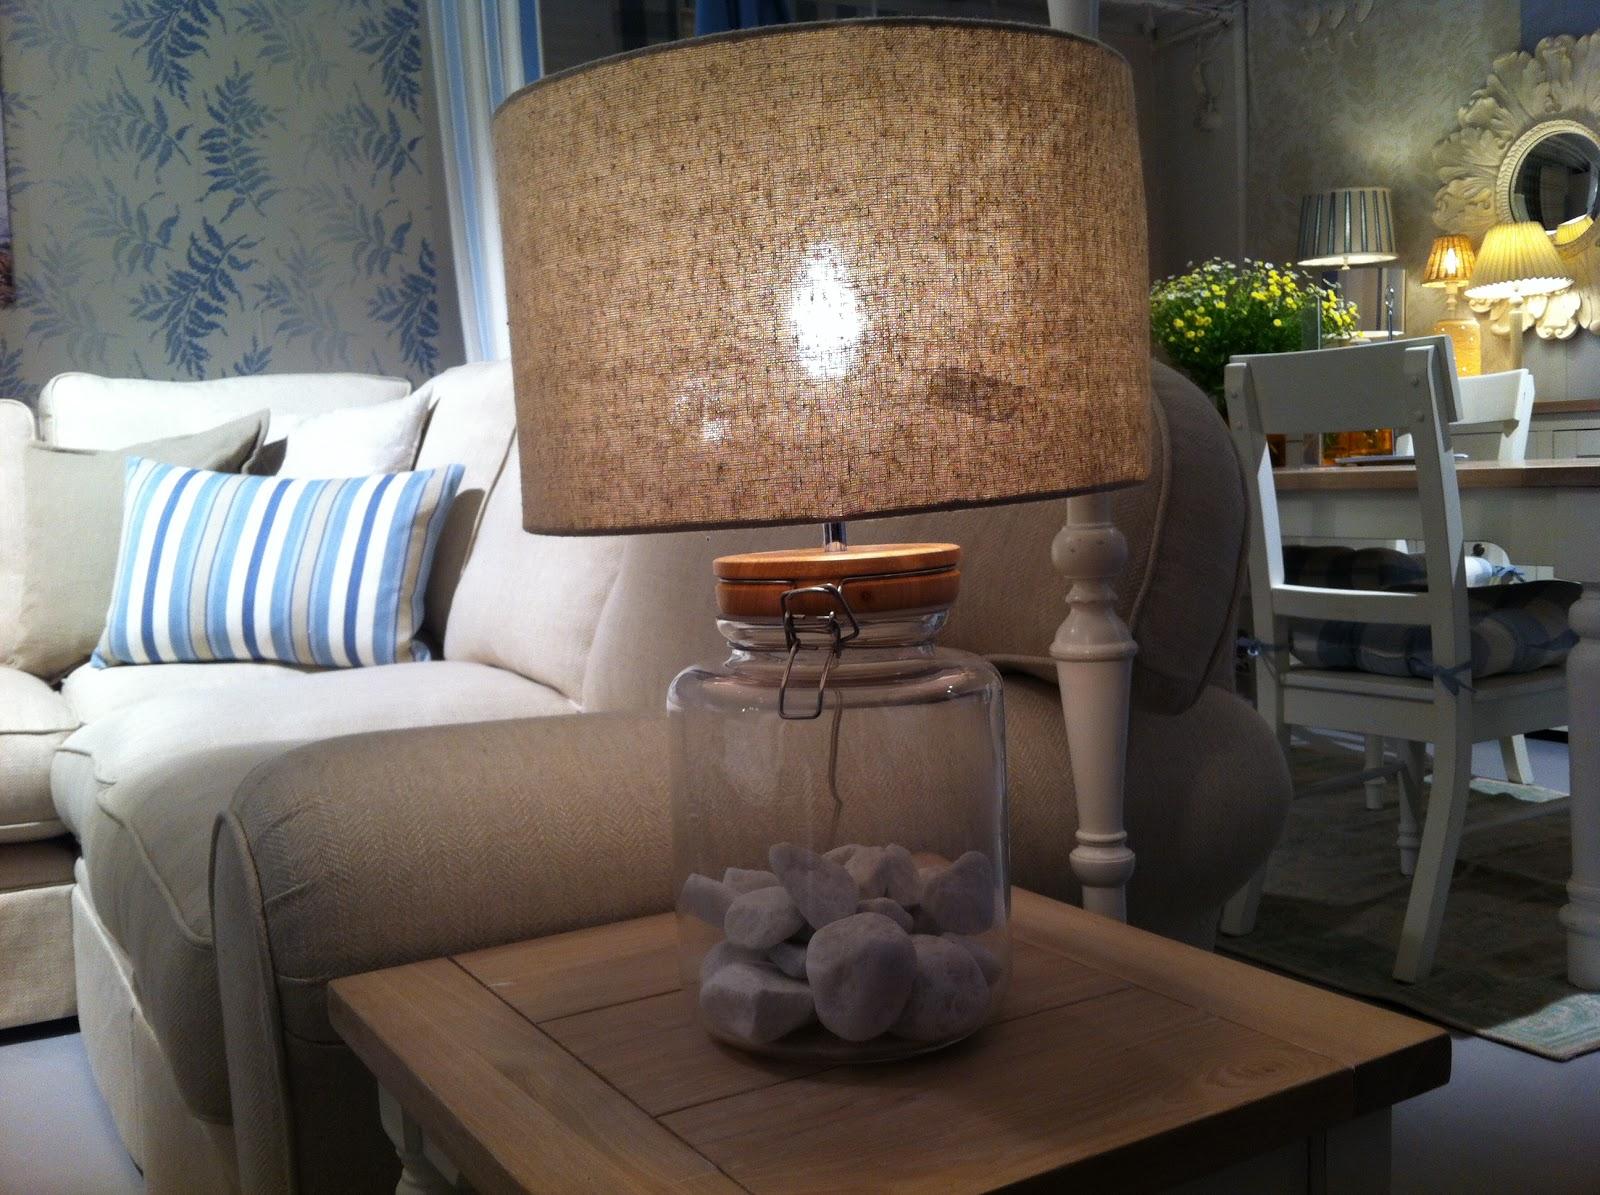 http://2.bp.blogspot.com/-RkTt6Eujgc4/UJu11KbDNdI/AAAAAAAAB8c/mqslVJBuNAc/s1600/laura-ashley-kilner-jar-lamp.JPG